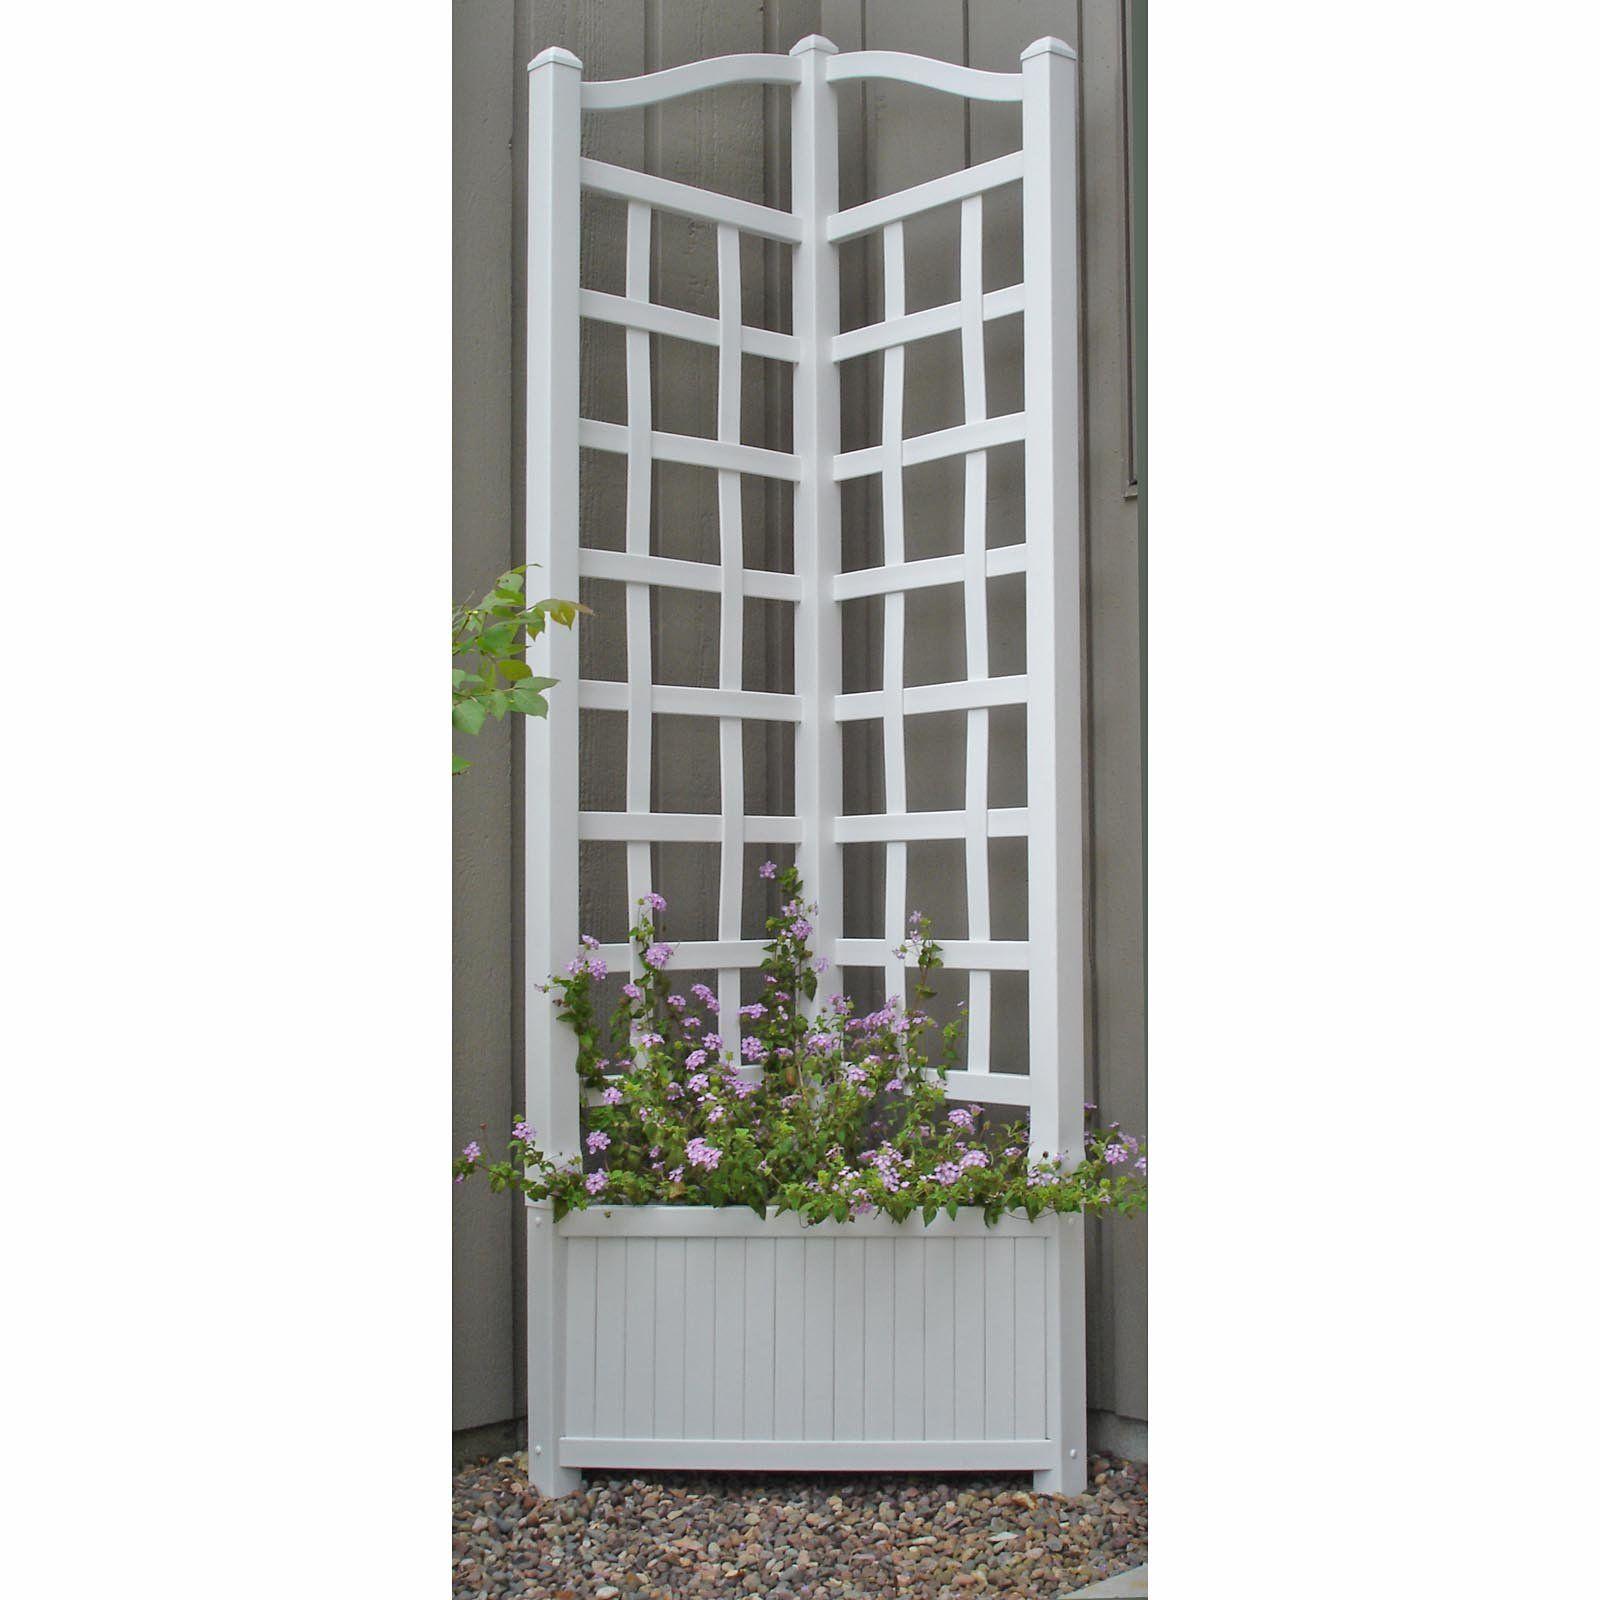 Corner Trellis Ideas Part - 27: Wooden Planter With Trellis... Great Idea For Patio Corner Post!